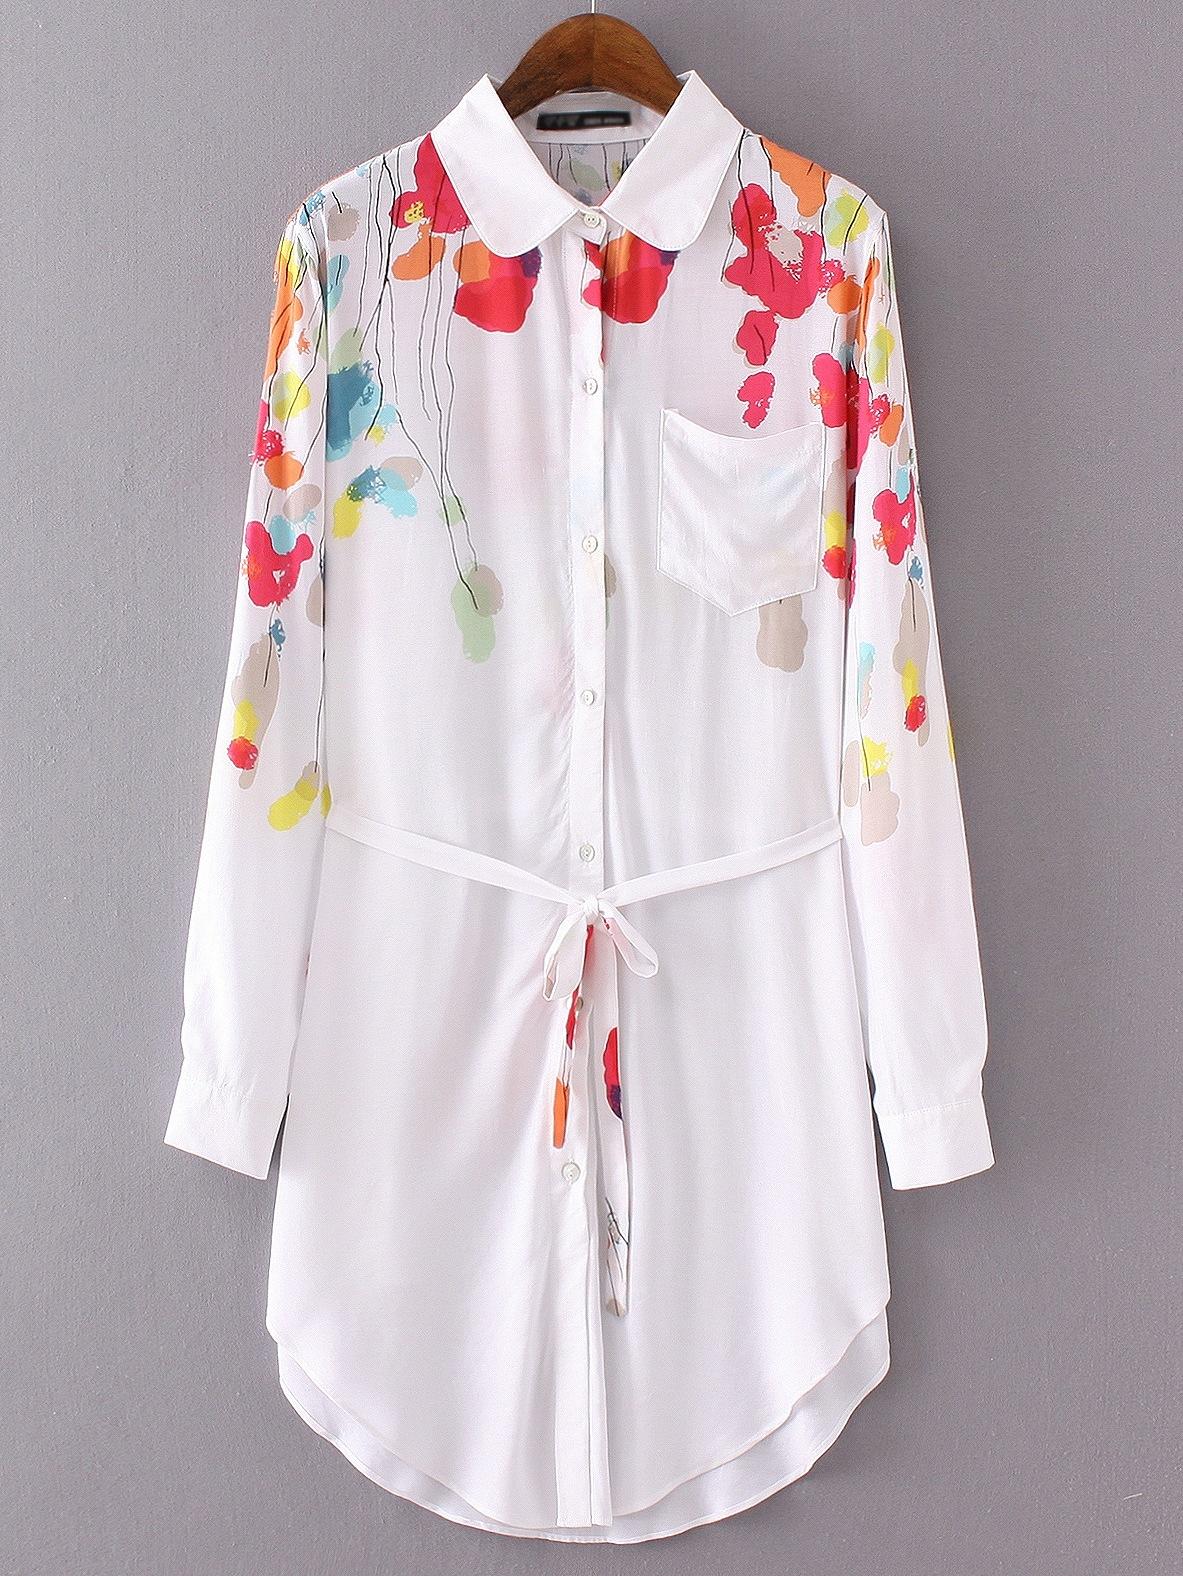 White Lapel Floral Pocket Shirt Dress With Belt dress160709220